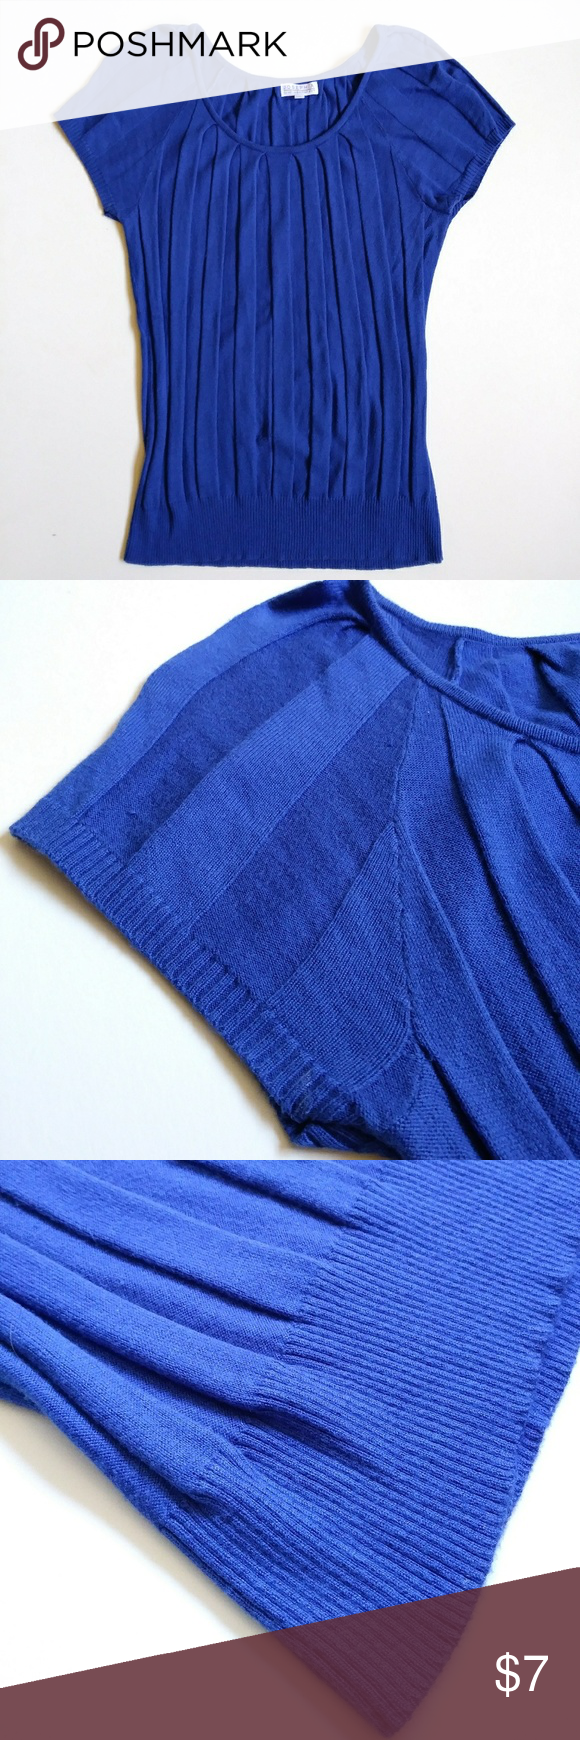 Sweater Shirt GUC. Cute light sweater for the cooler days ...